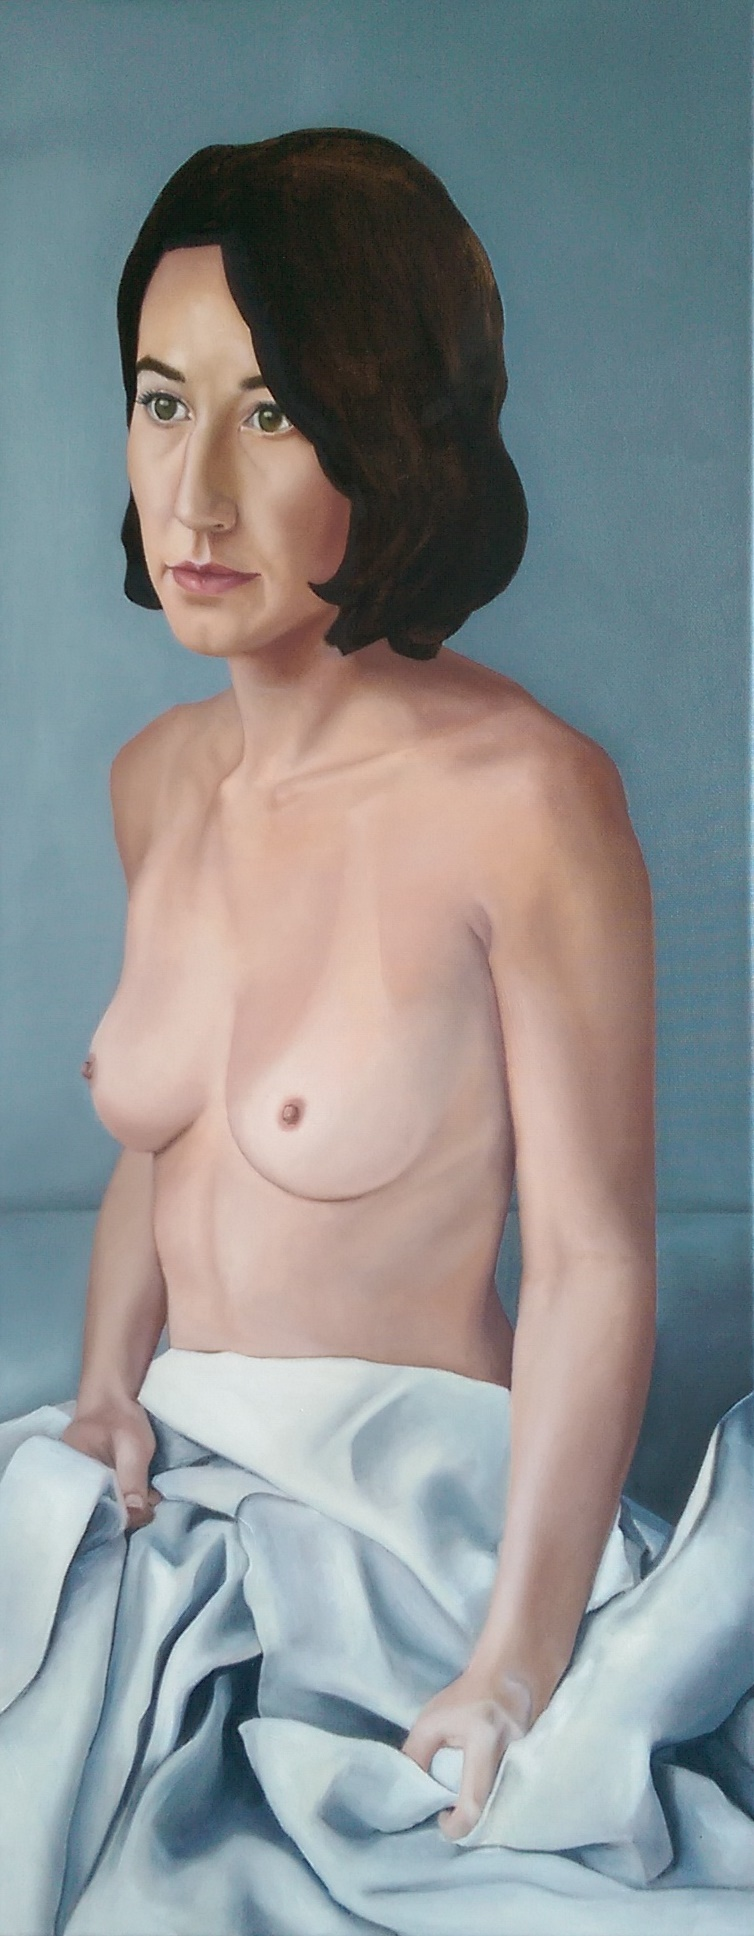 Antonie - 2014 (commissioned work)